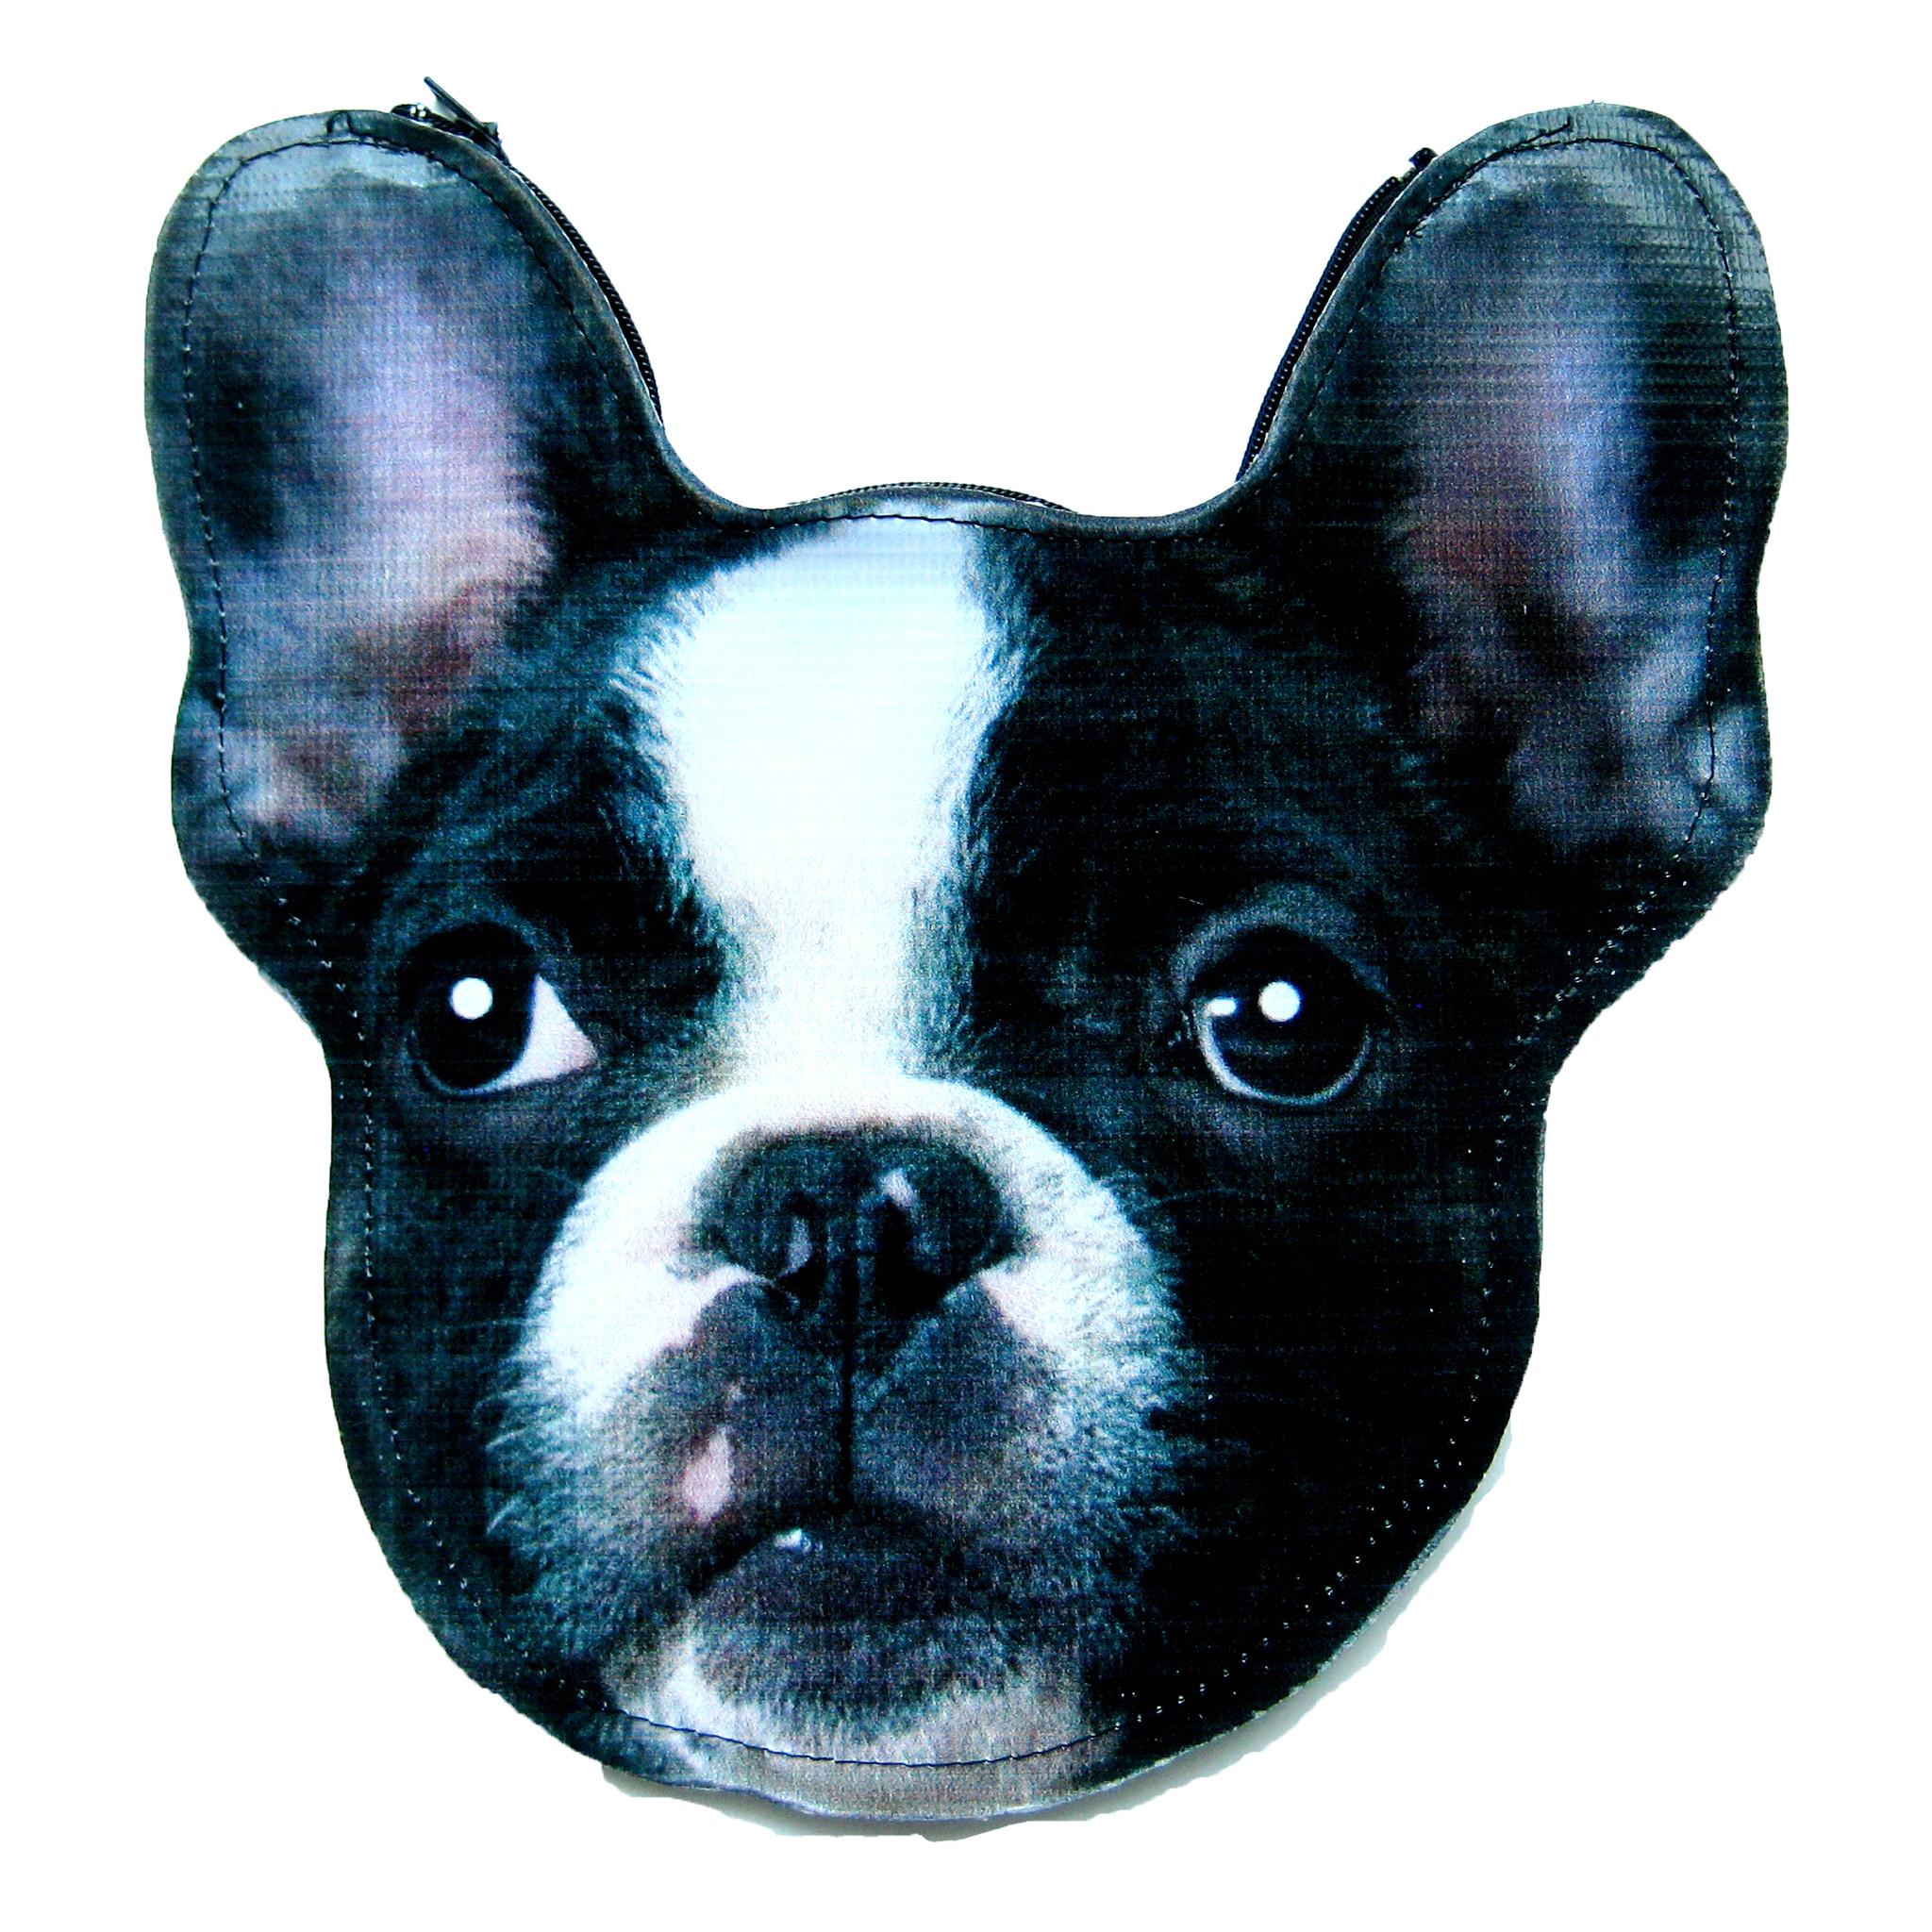 French Bulldog Puppy Dog Head Shaped Vinyl Animal Themed Clutch Bag ...